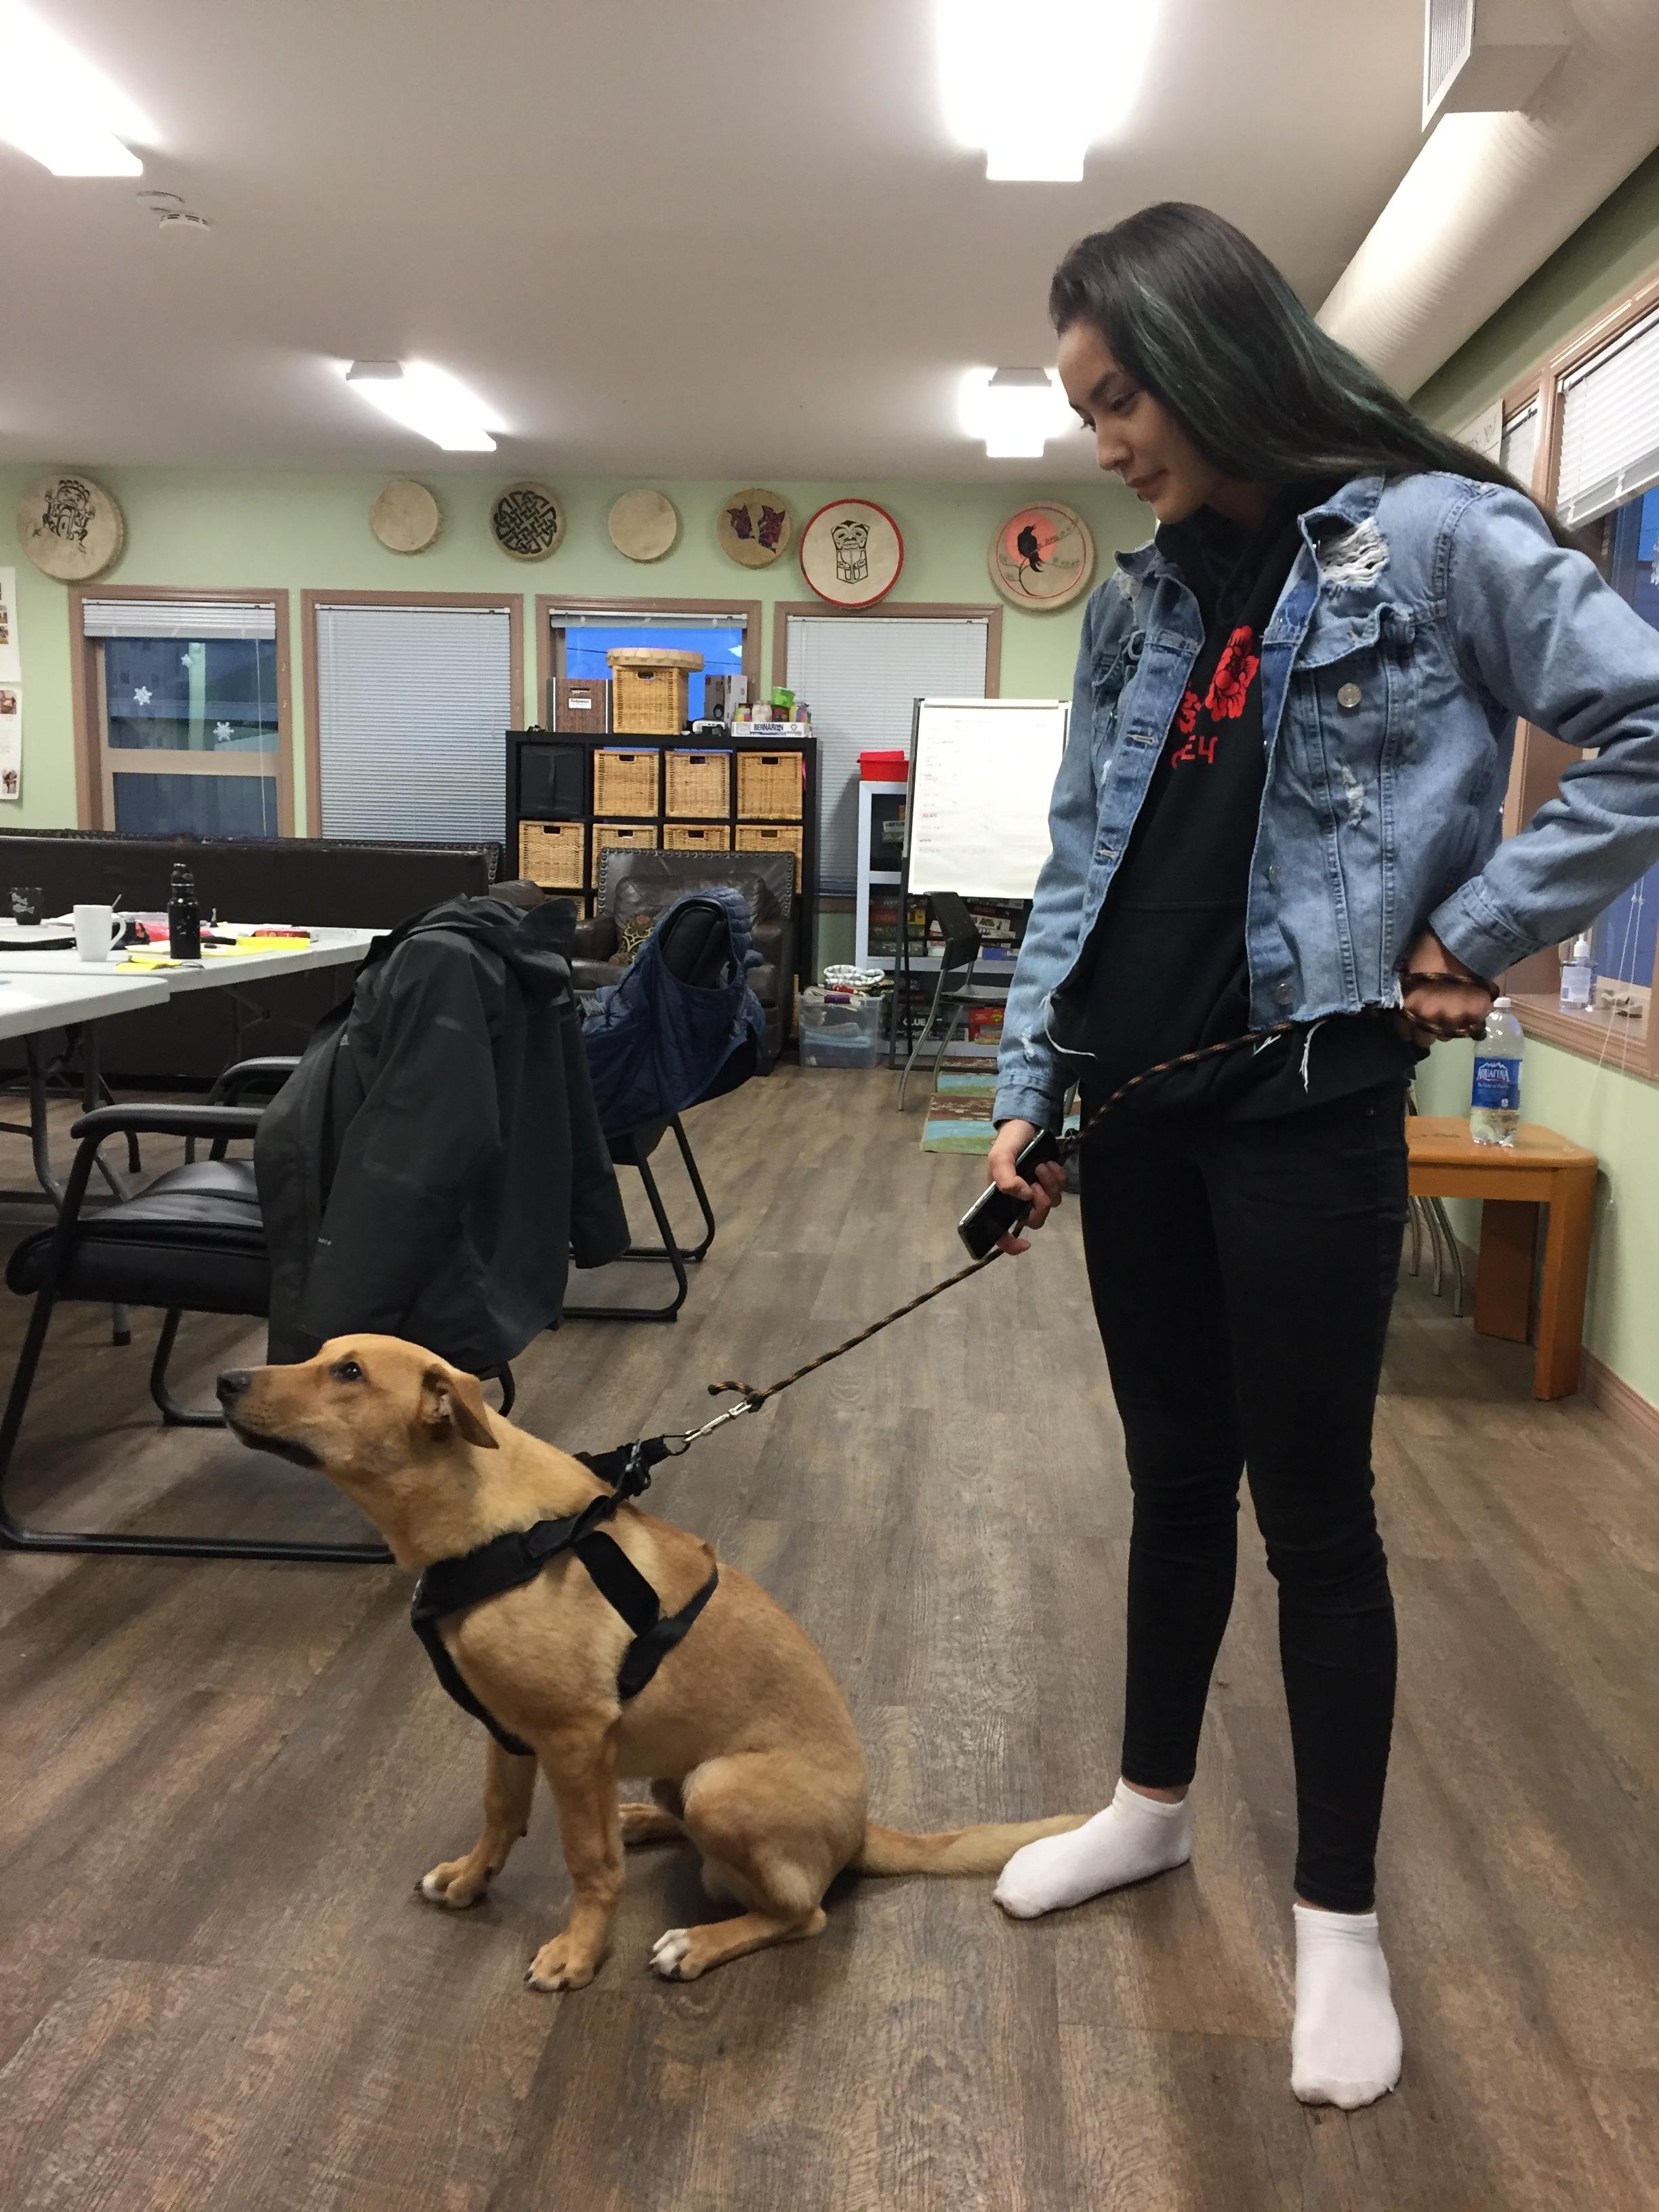 We get to meet Bella's adorable dog BRUCE!